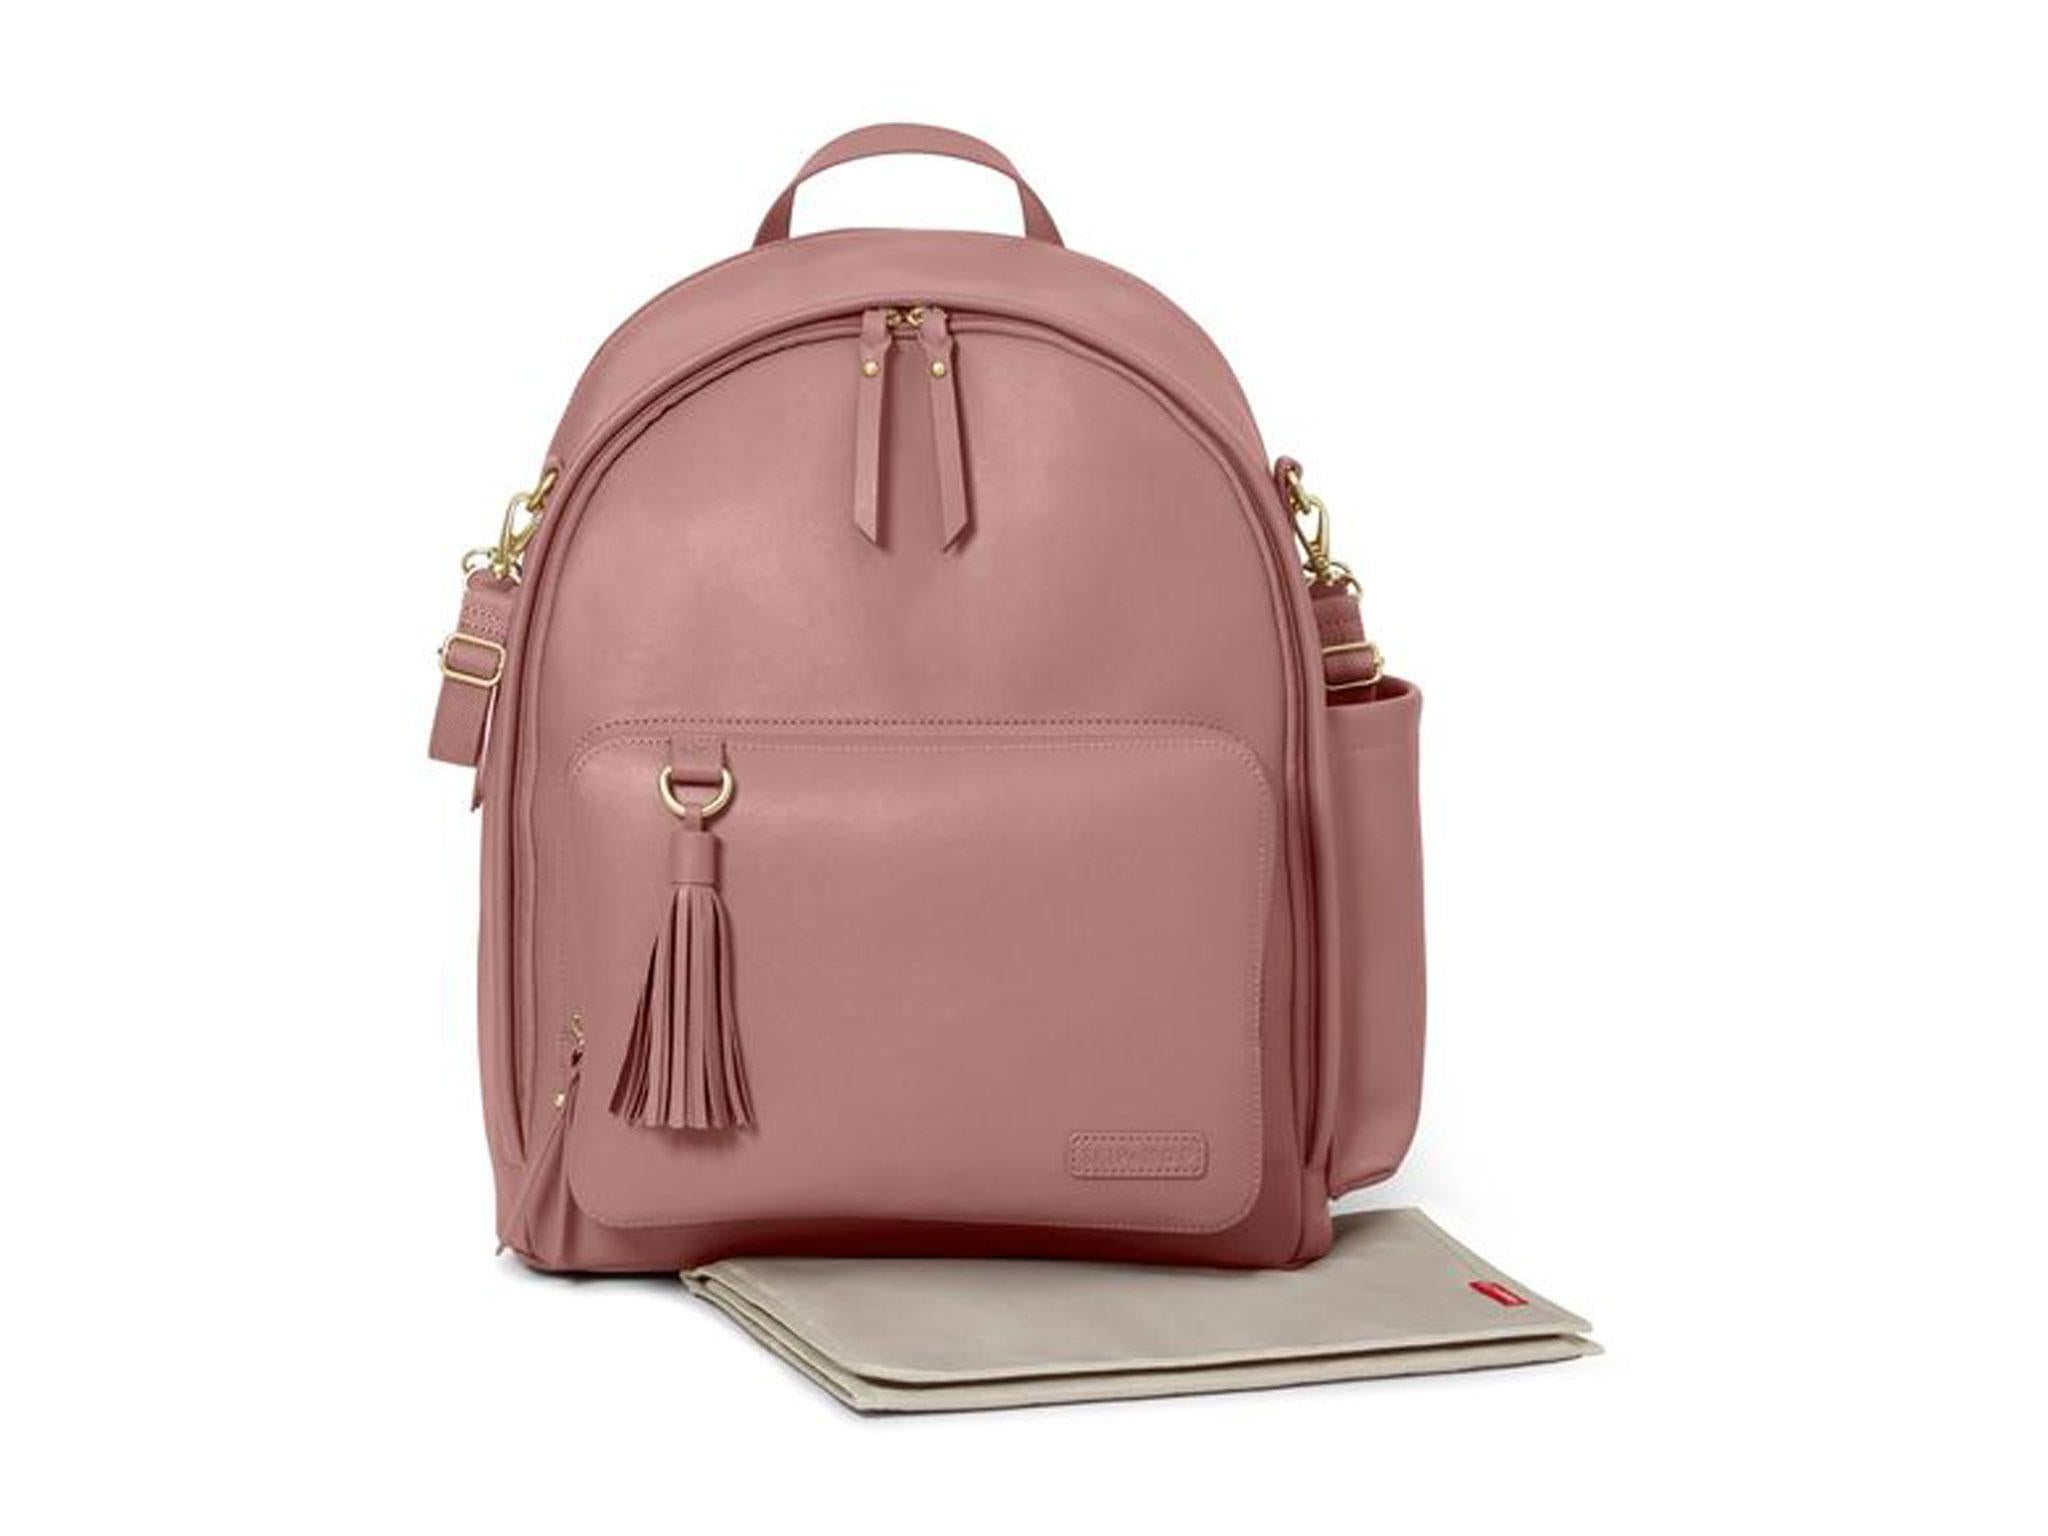 Skip Hop Greenwich Simply Chic backpack f2cd57b6824b2